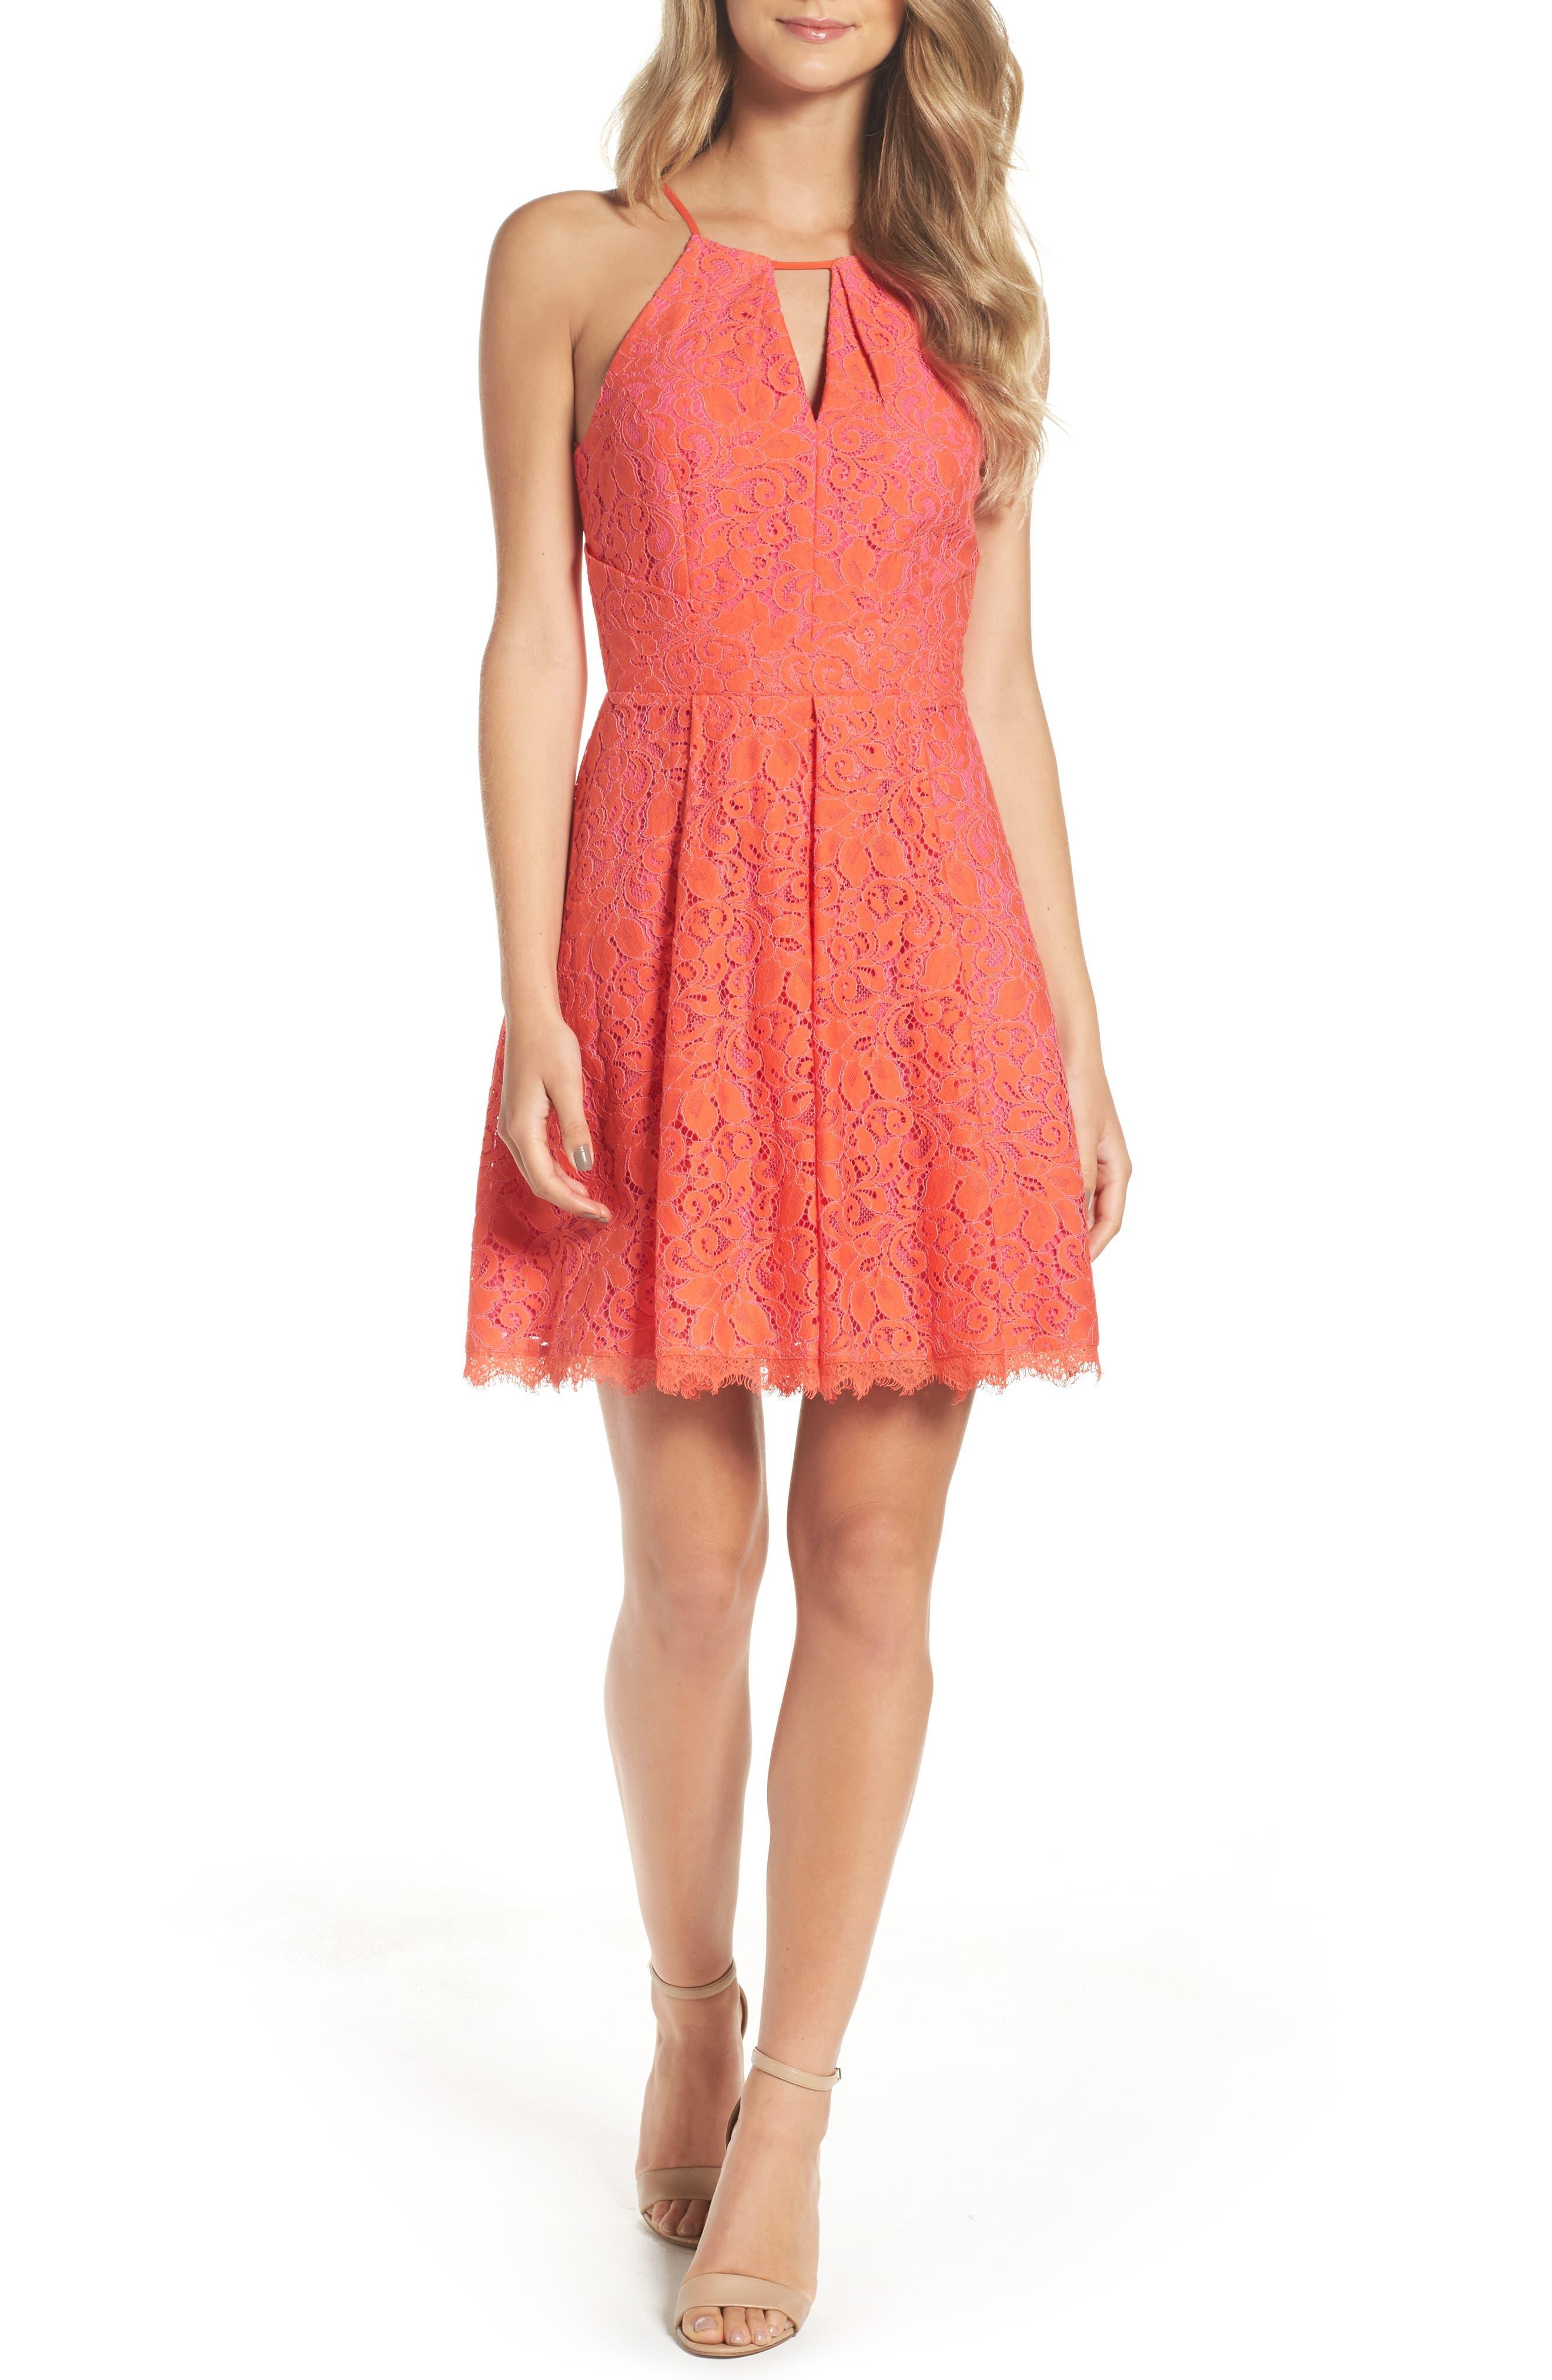 Adelyn Rae Renée Lace Fit & Flare Dress